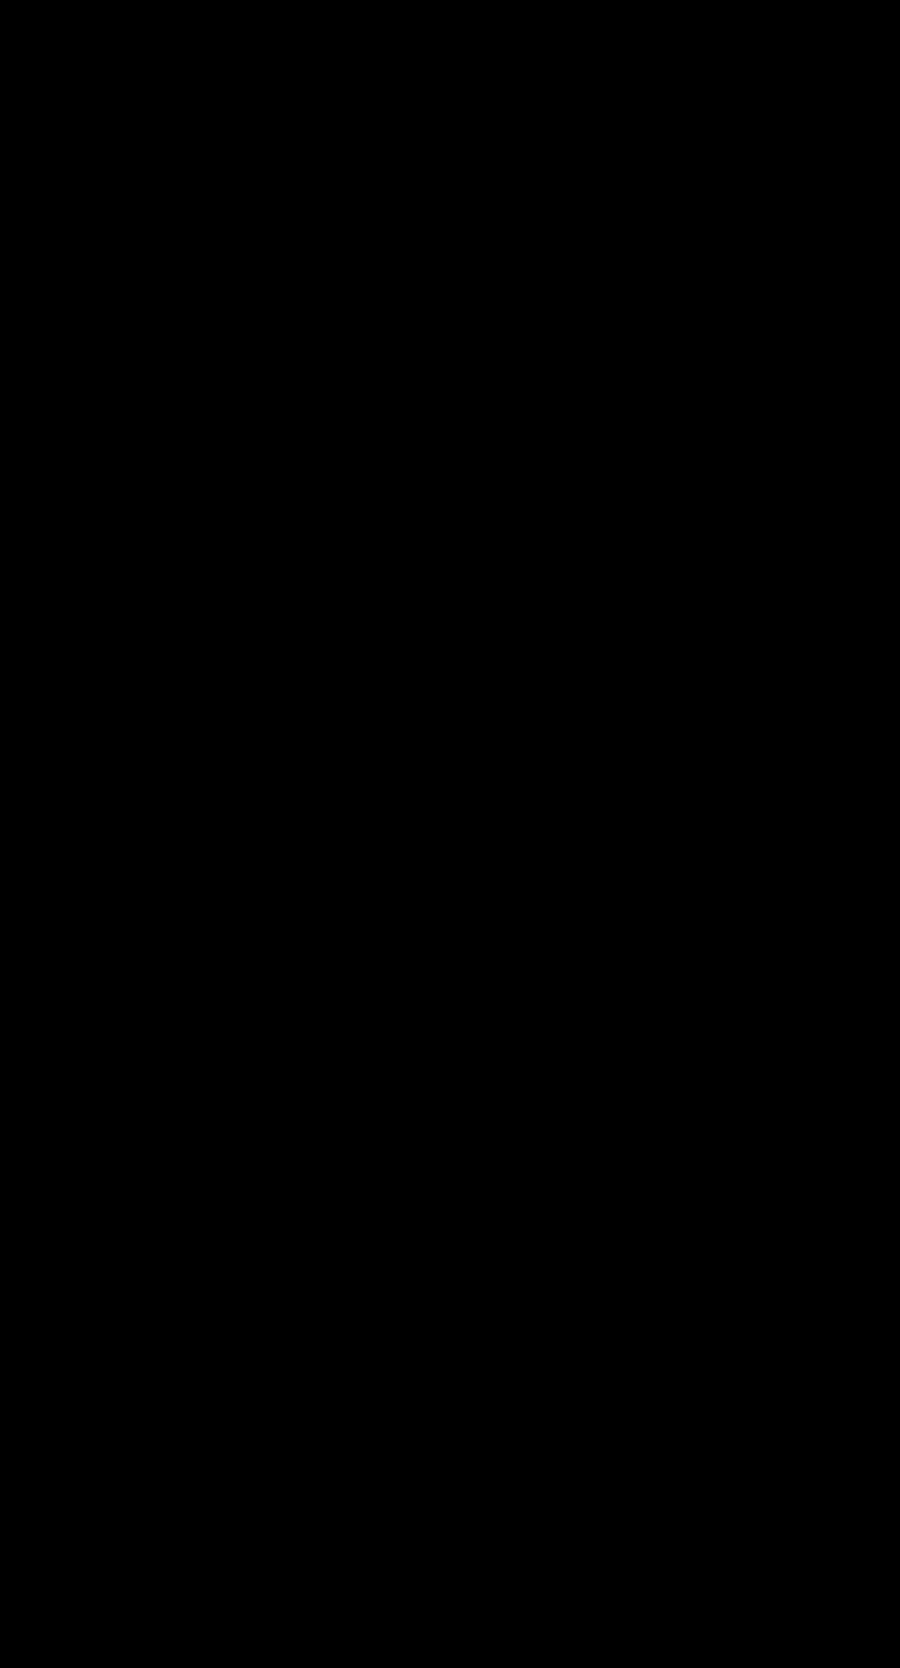 Line Art Zelda : Link stare line art by frozen phoenix on deviantart